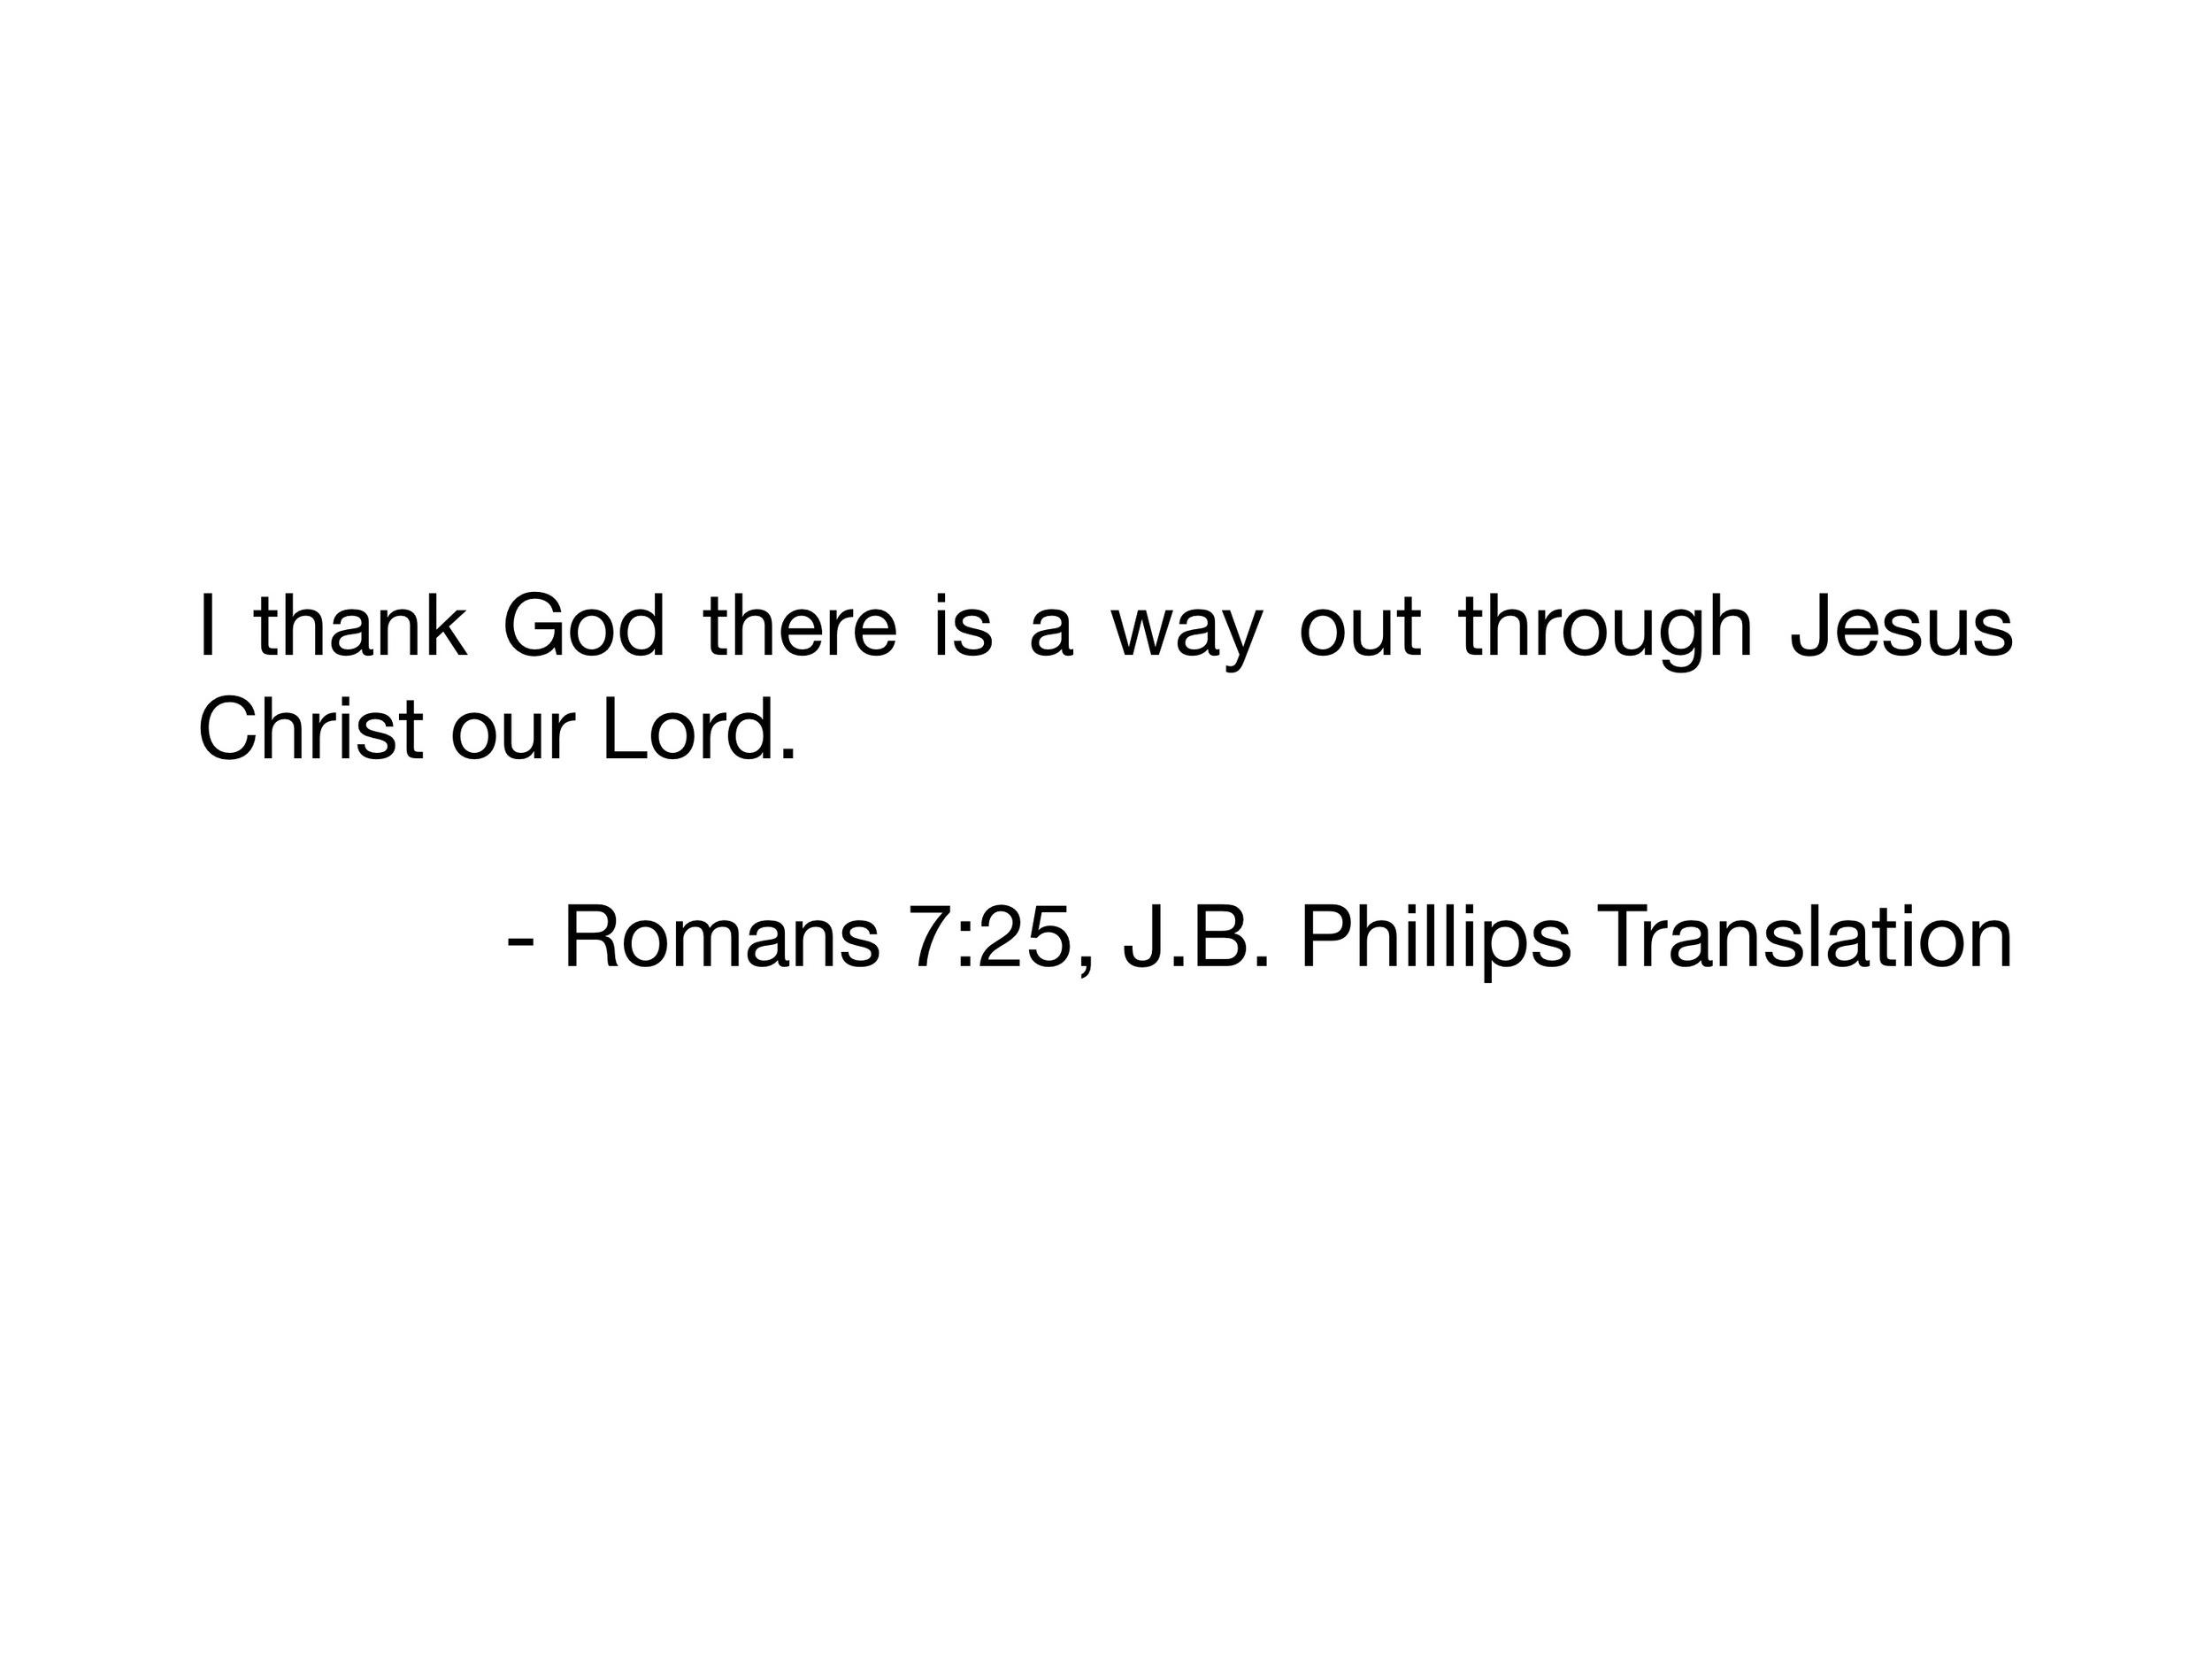 Romans 7:15-25 Sildes-1 33-33.jpeg